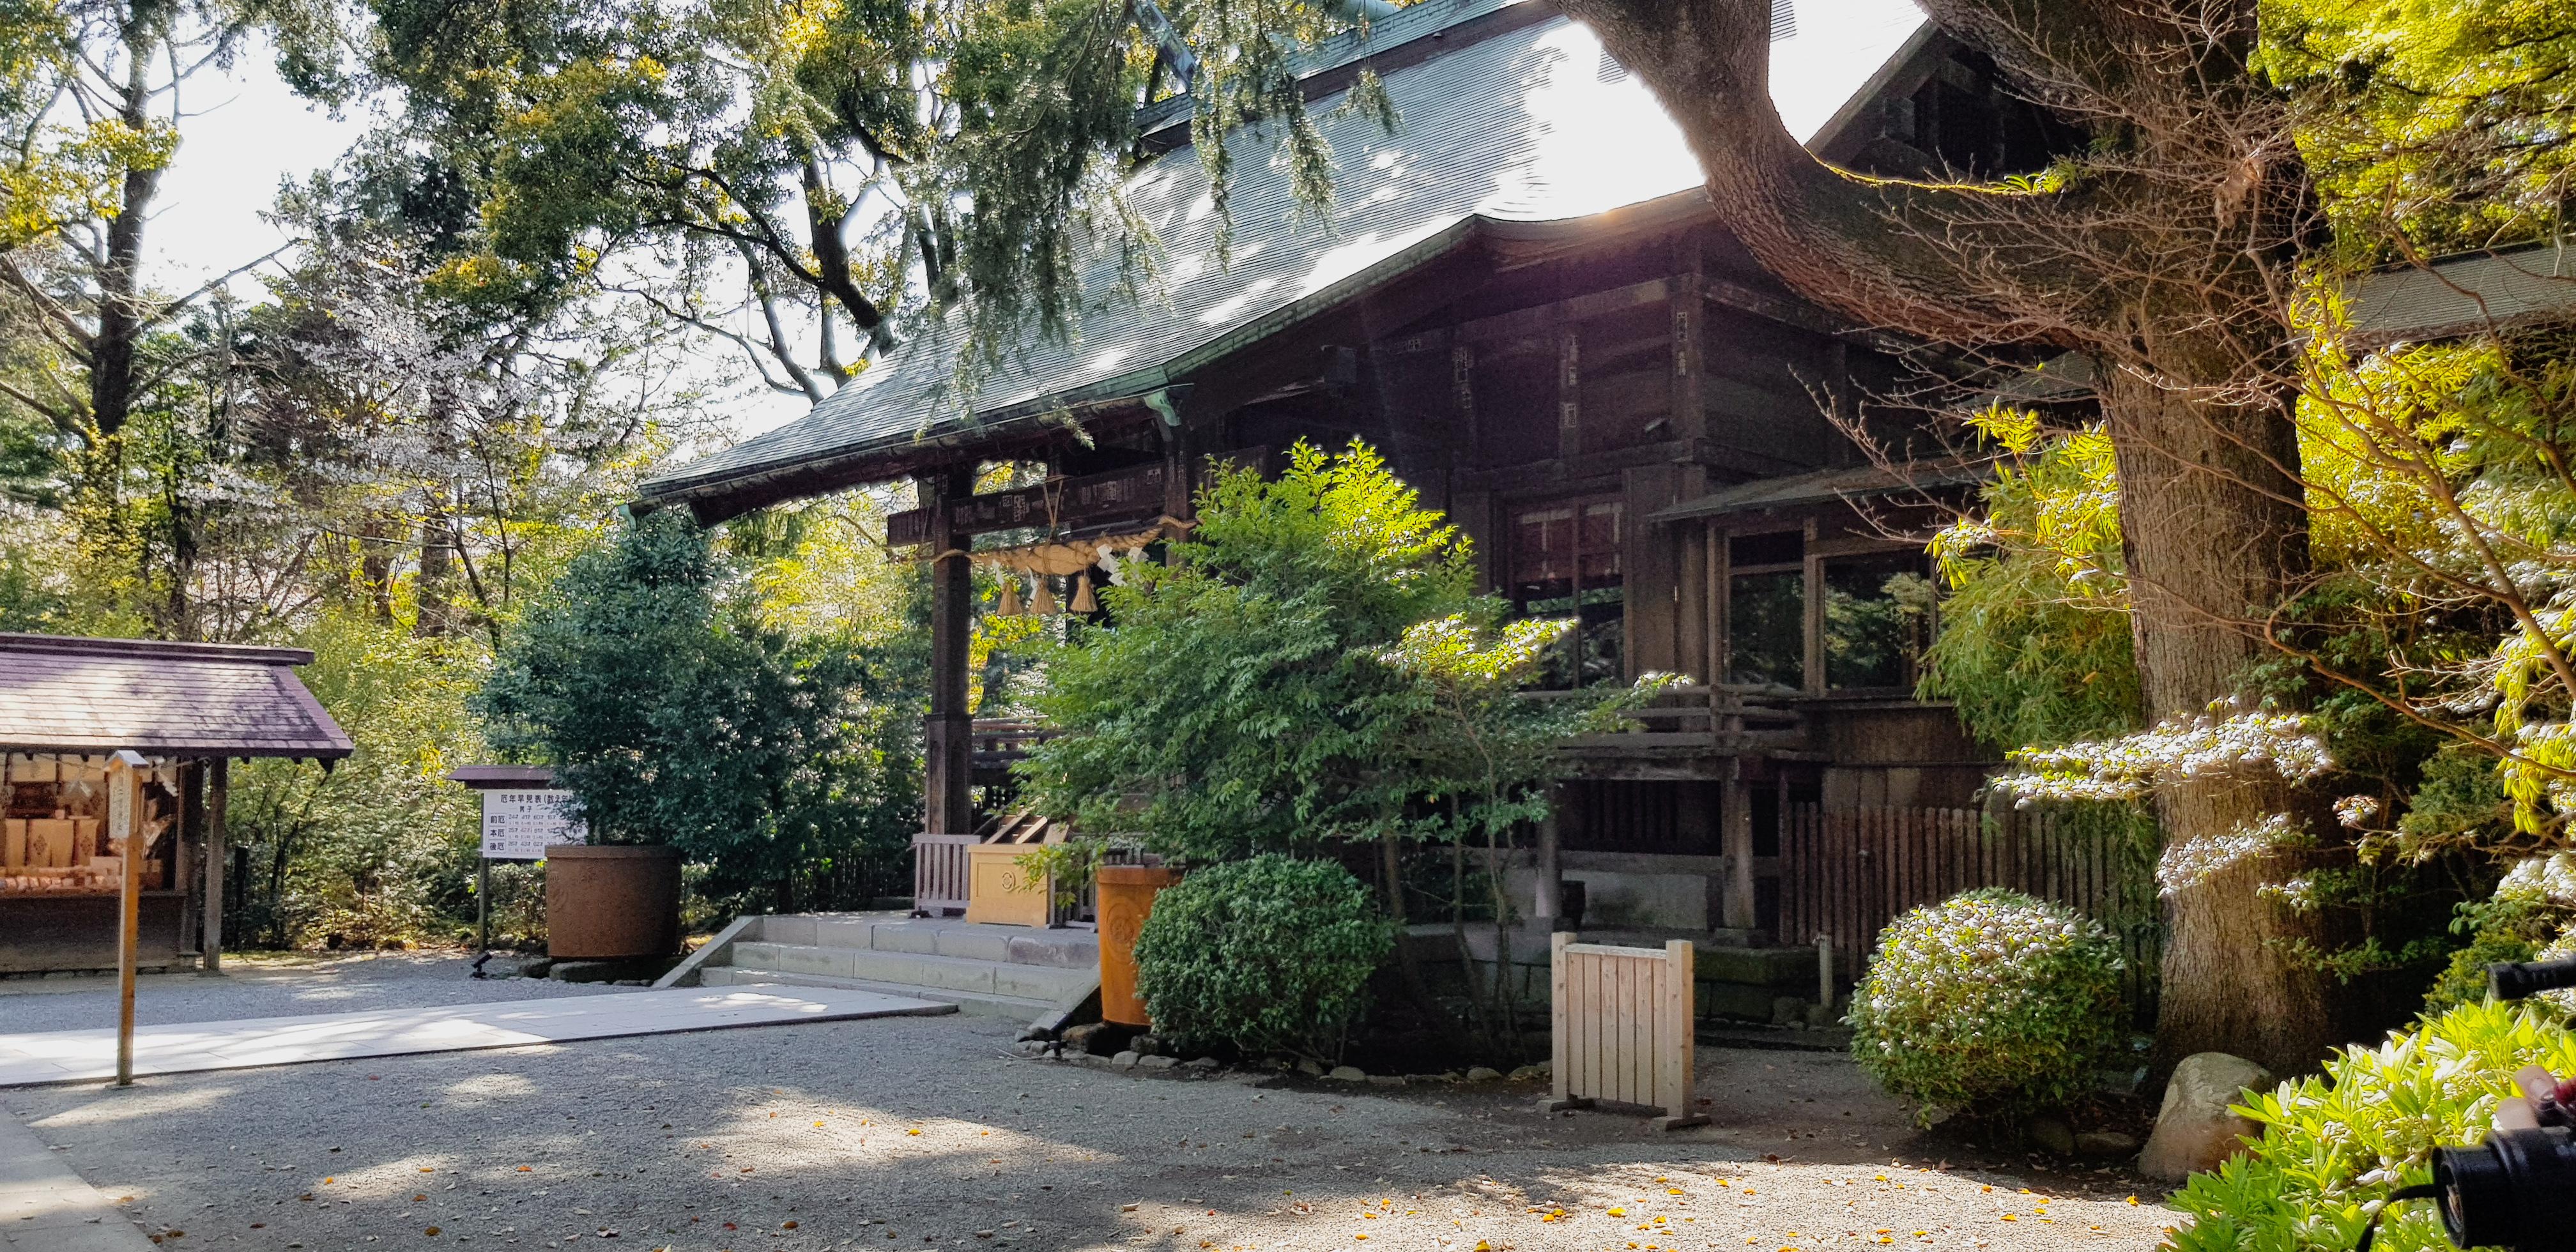 Hotoku Ninomiya Shrine Odawara Japan